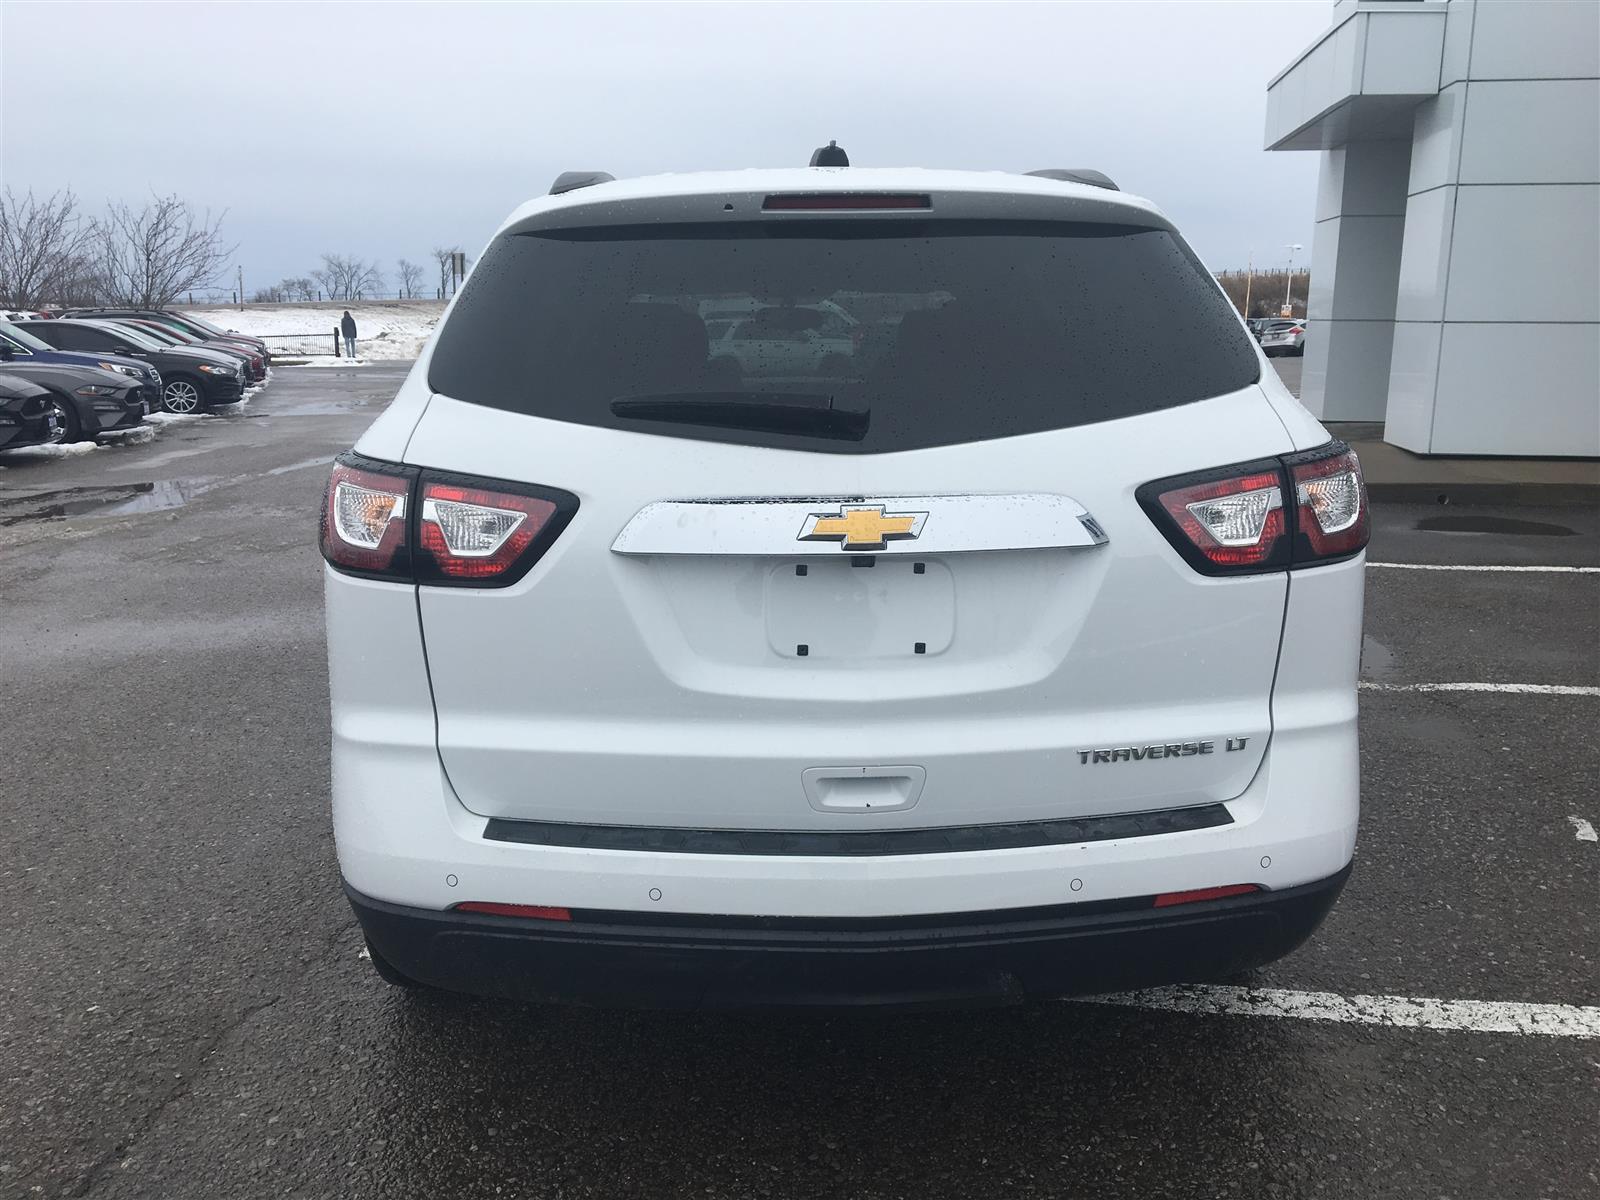 2016 Chevrolet Traverse 1LT 2WD